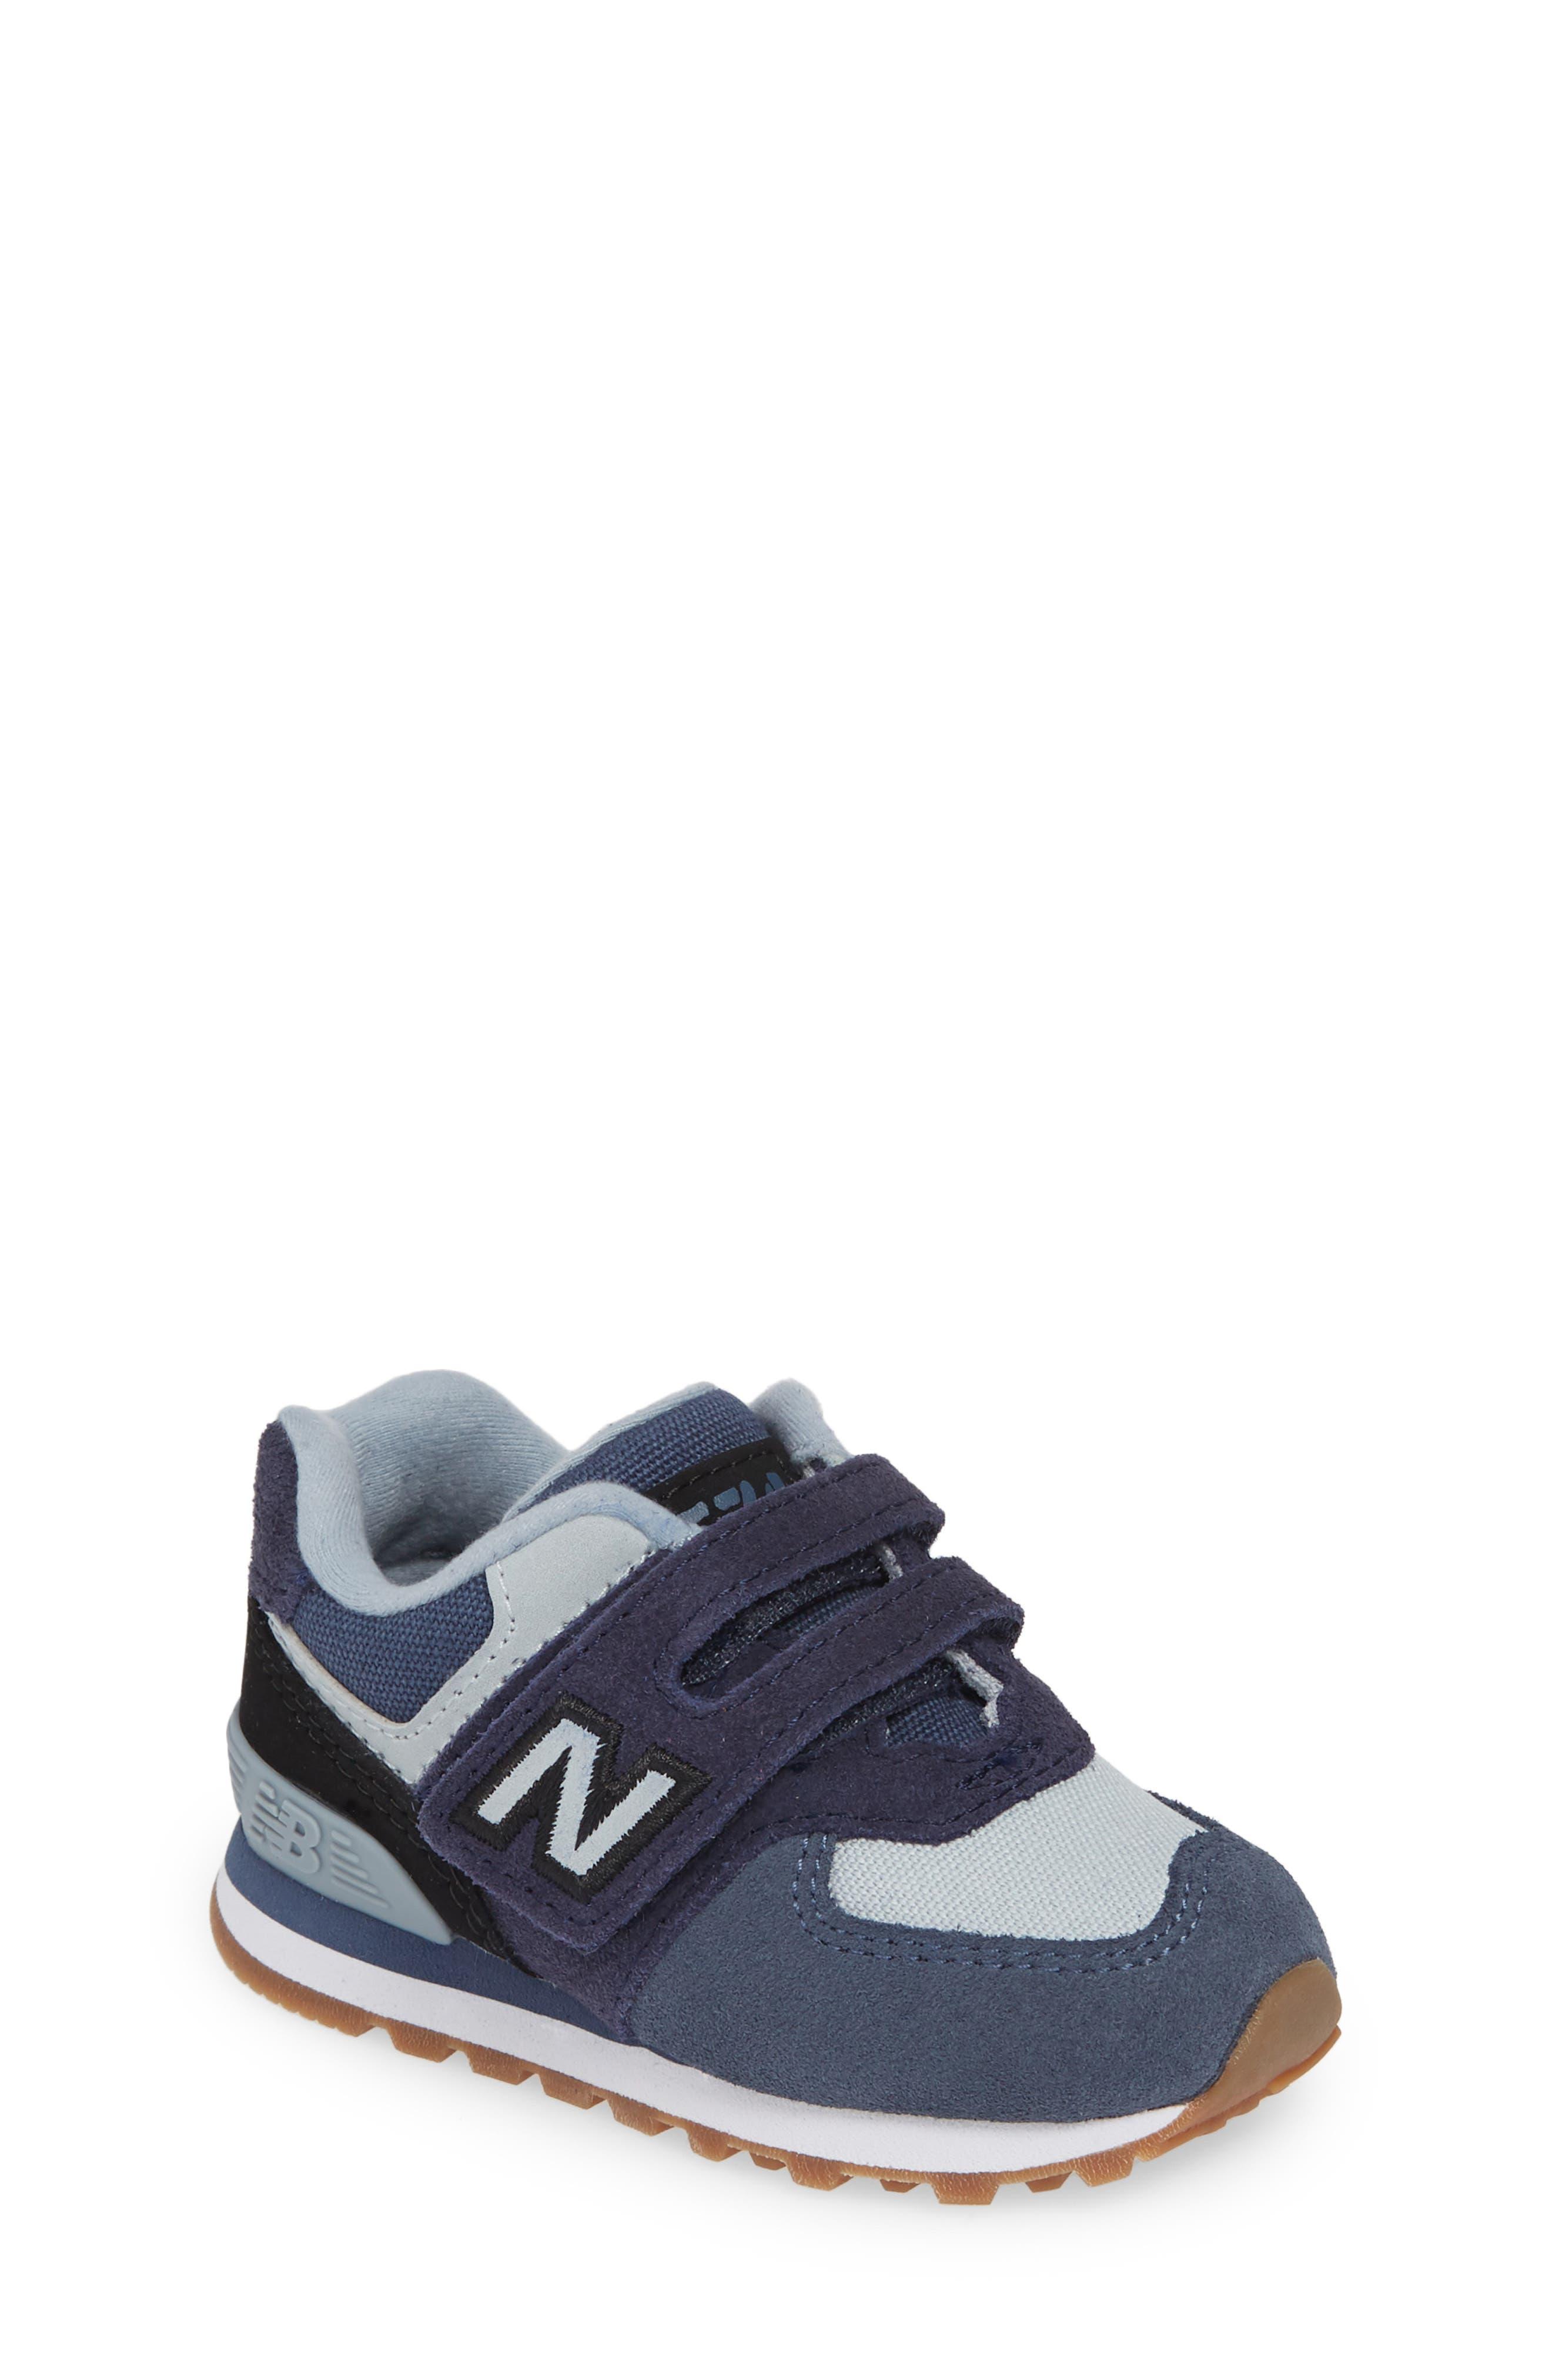 Toddler New Balance 574 Retro Surf Sneaker Size 7 W  Blue